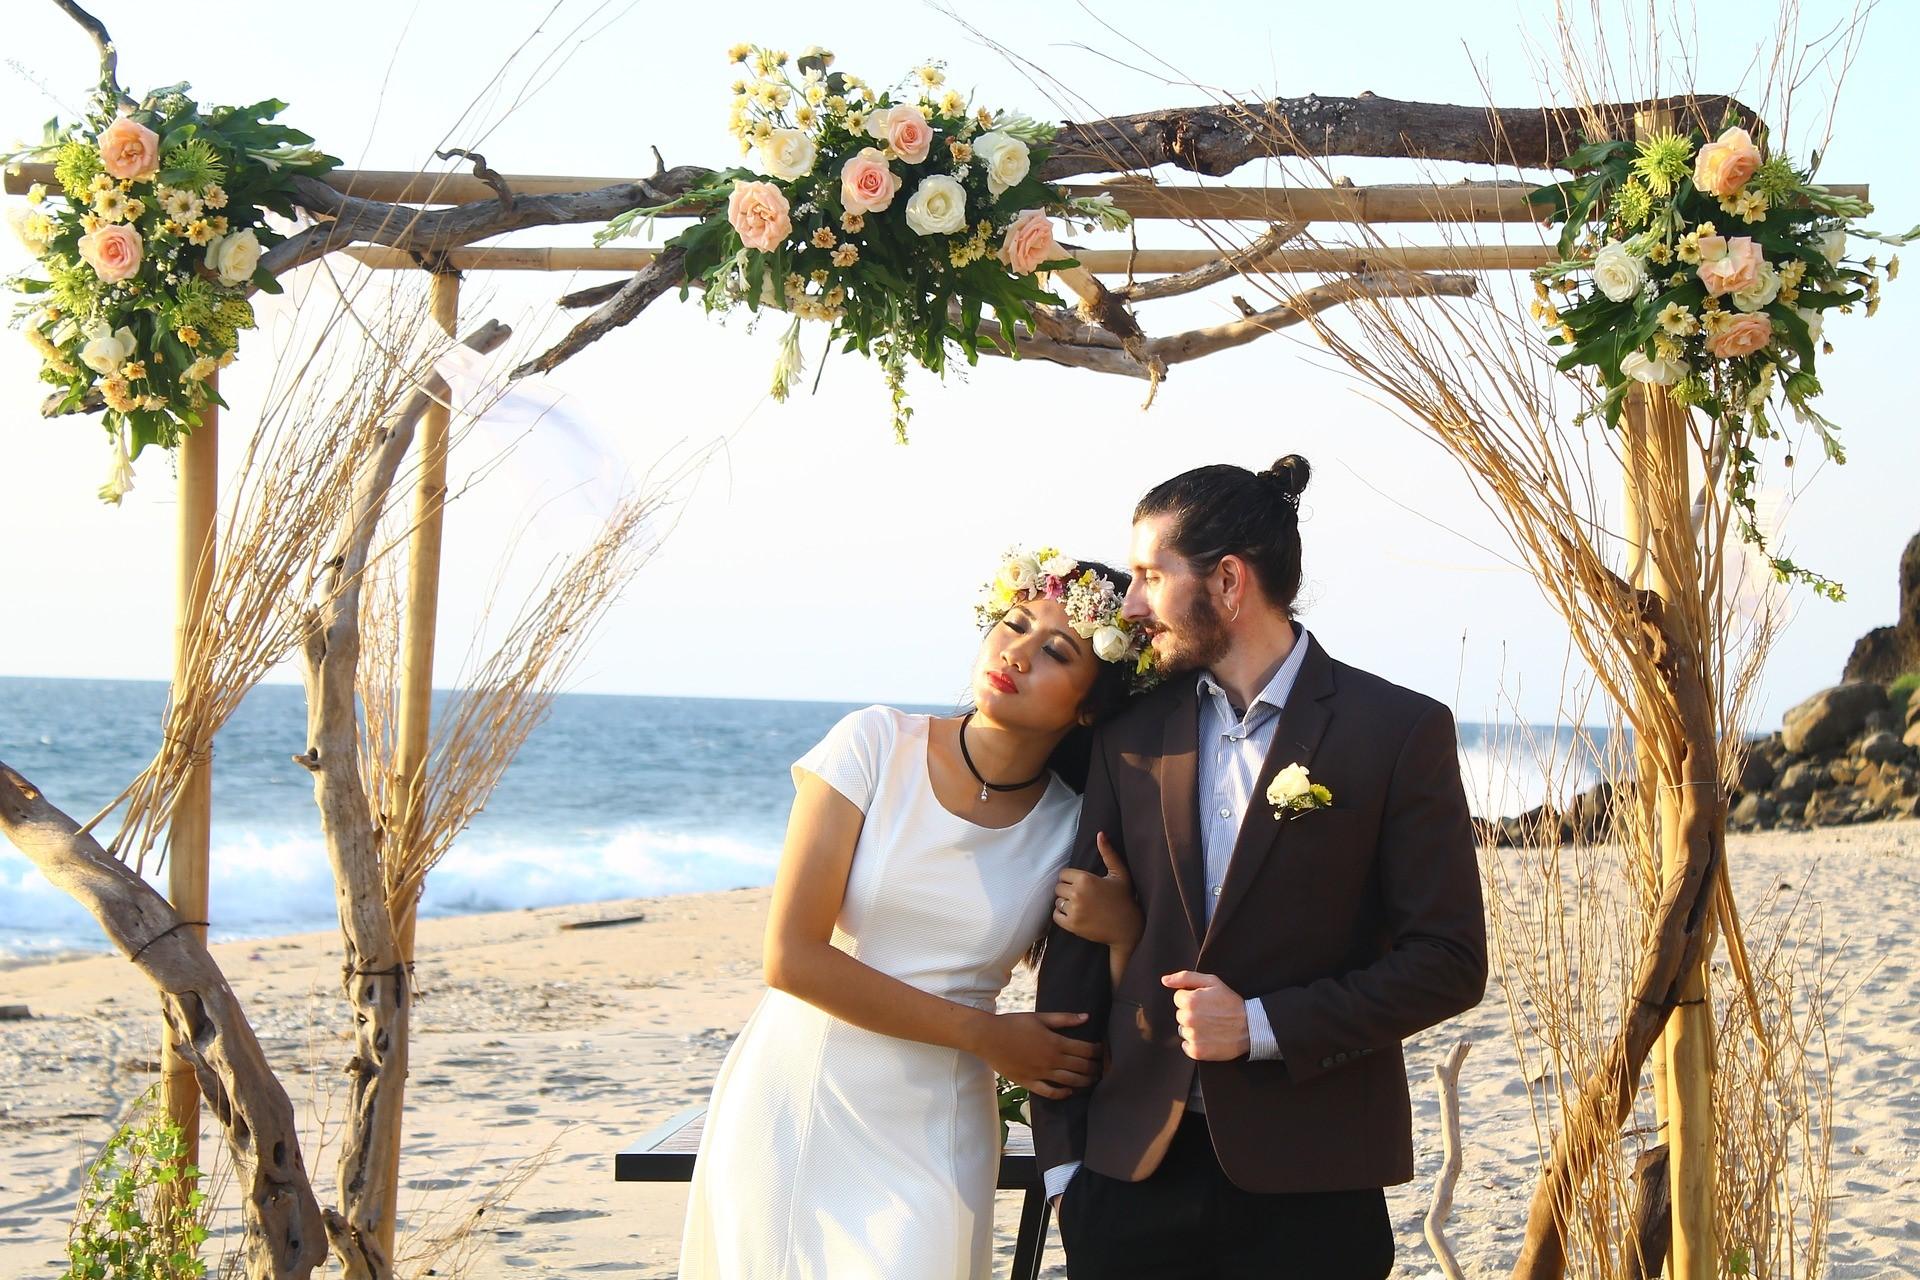 mariage a l etranger